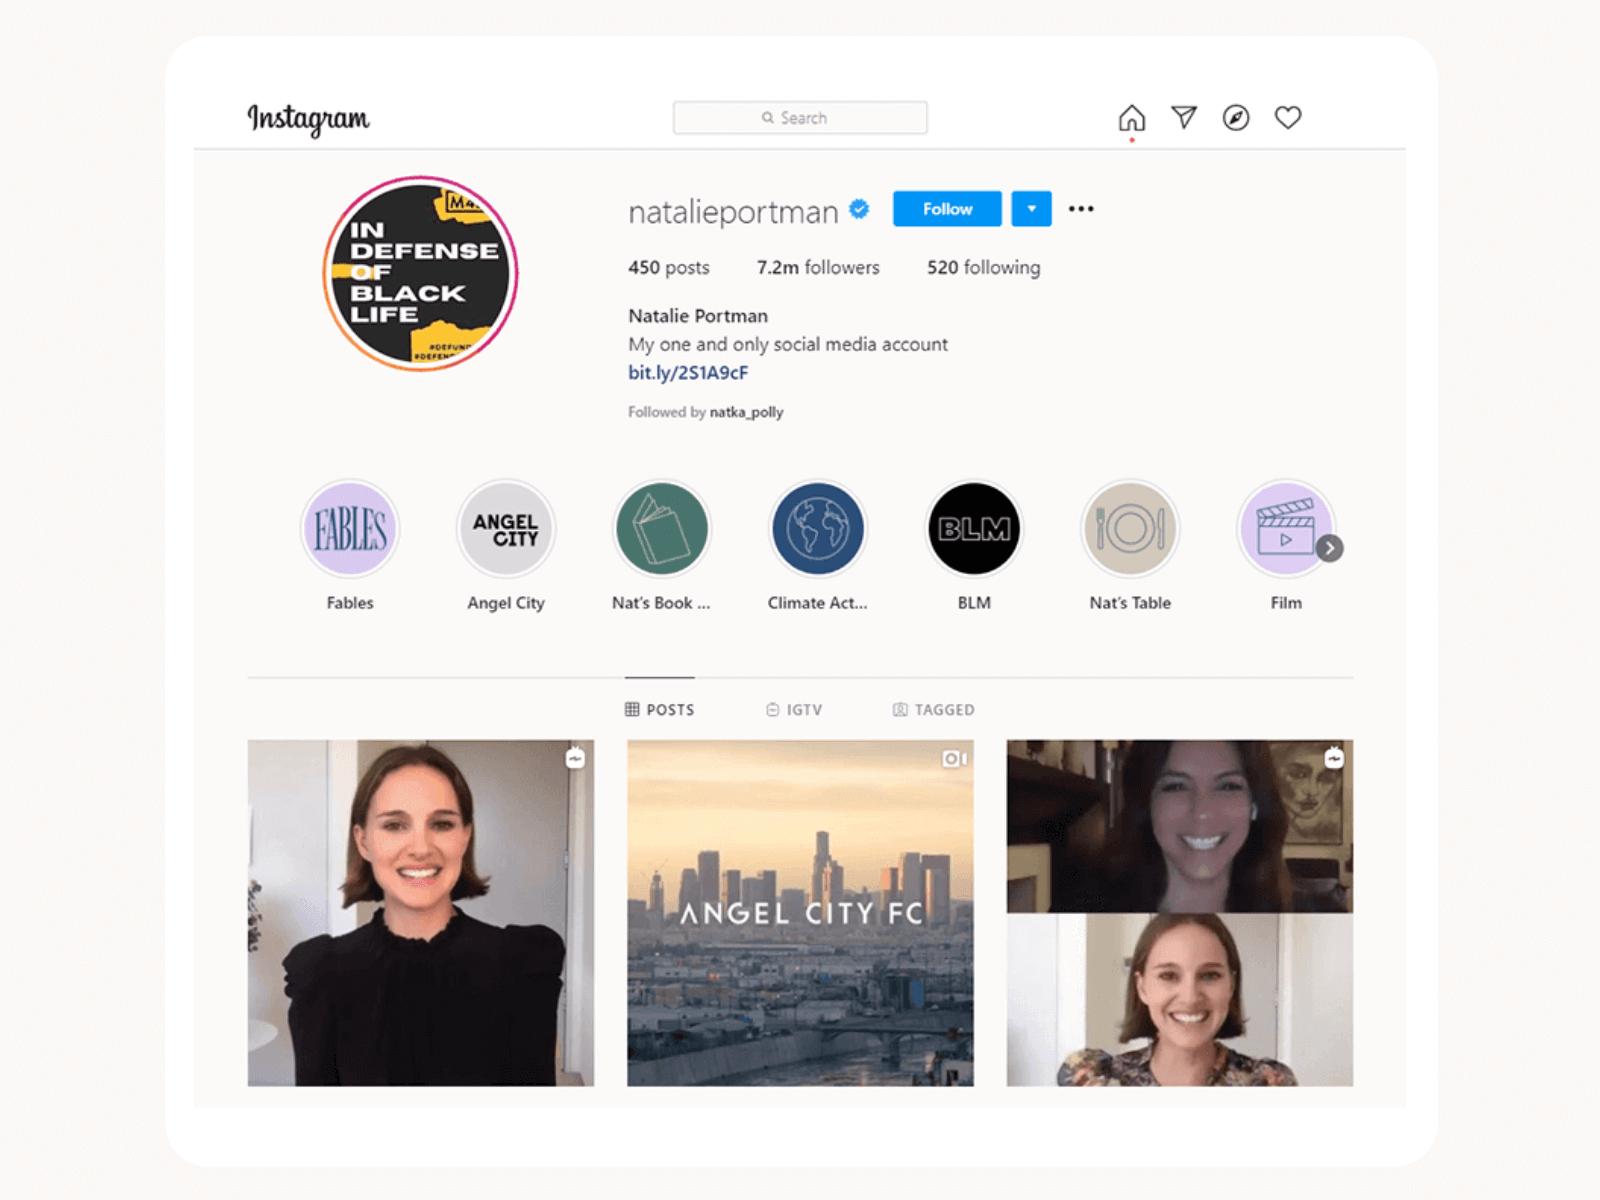 Natalie Portman's Instagram profile